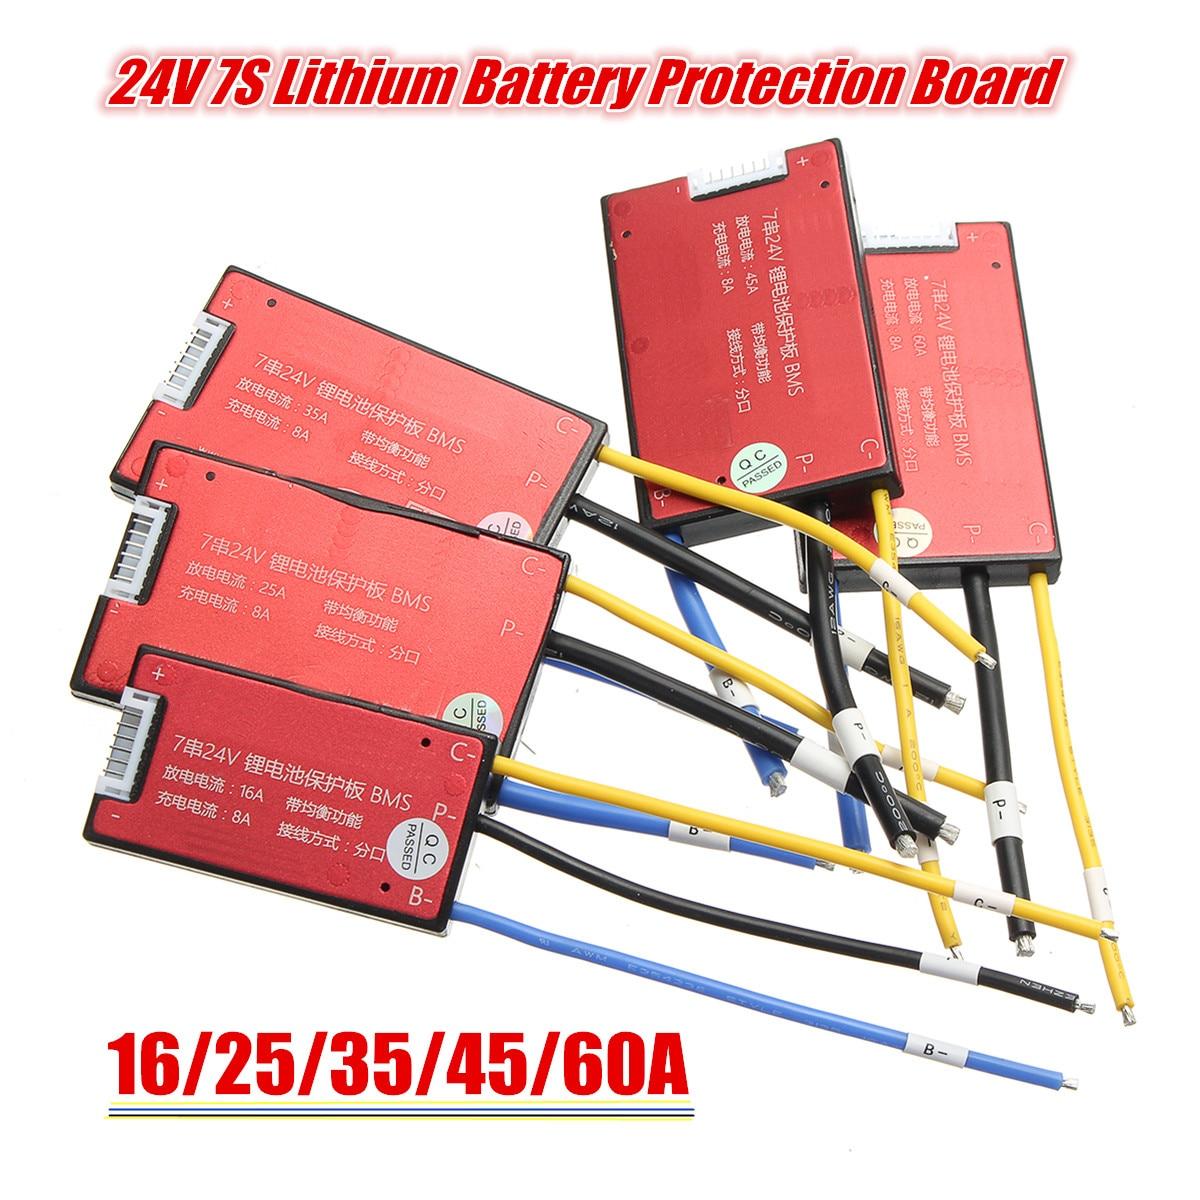 16 V/25A/35A/45A/60A 7S 18650 литий-ионный Литий-полимерный аккумулятор BMS PCB PCM плата защиты батареи для Ebike